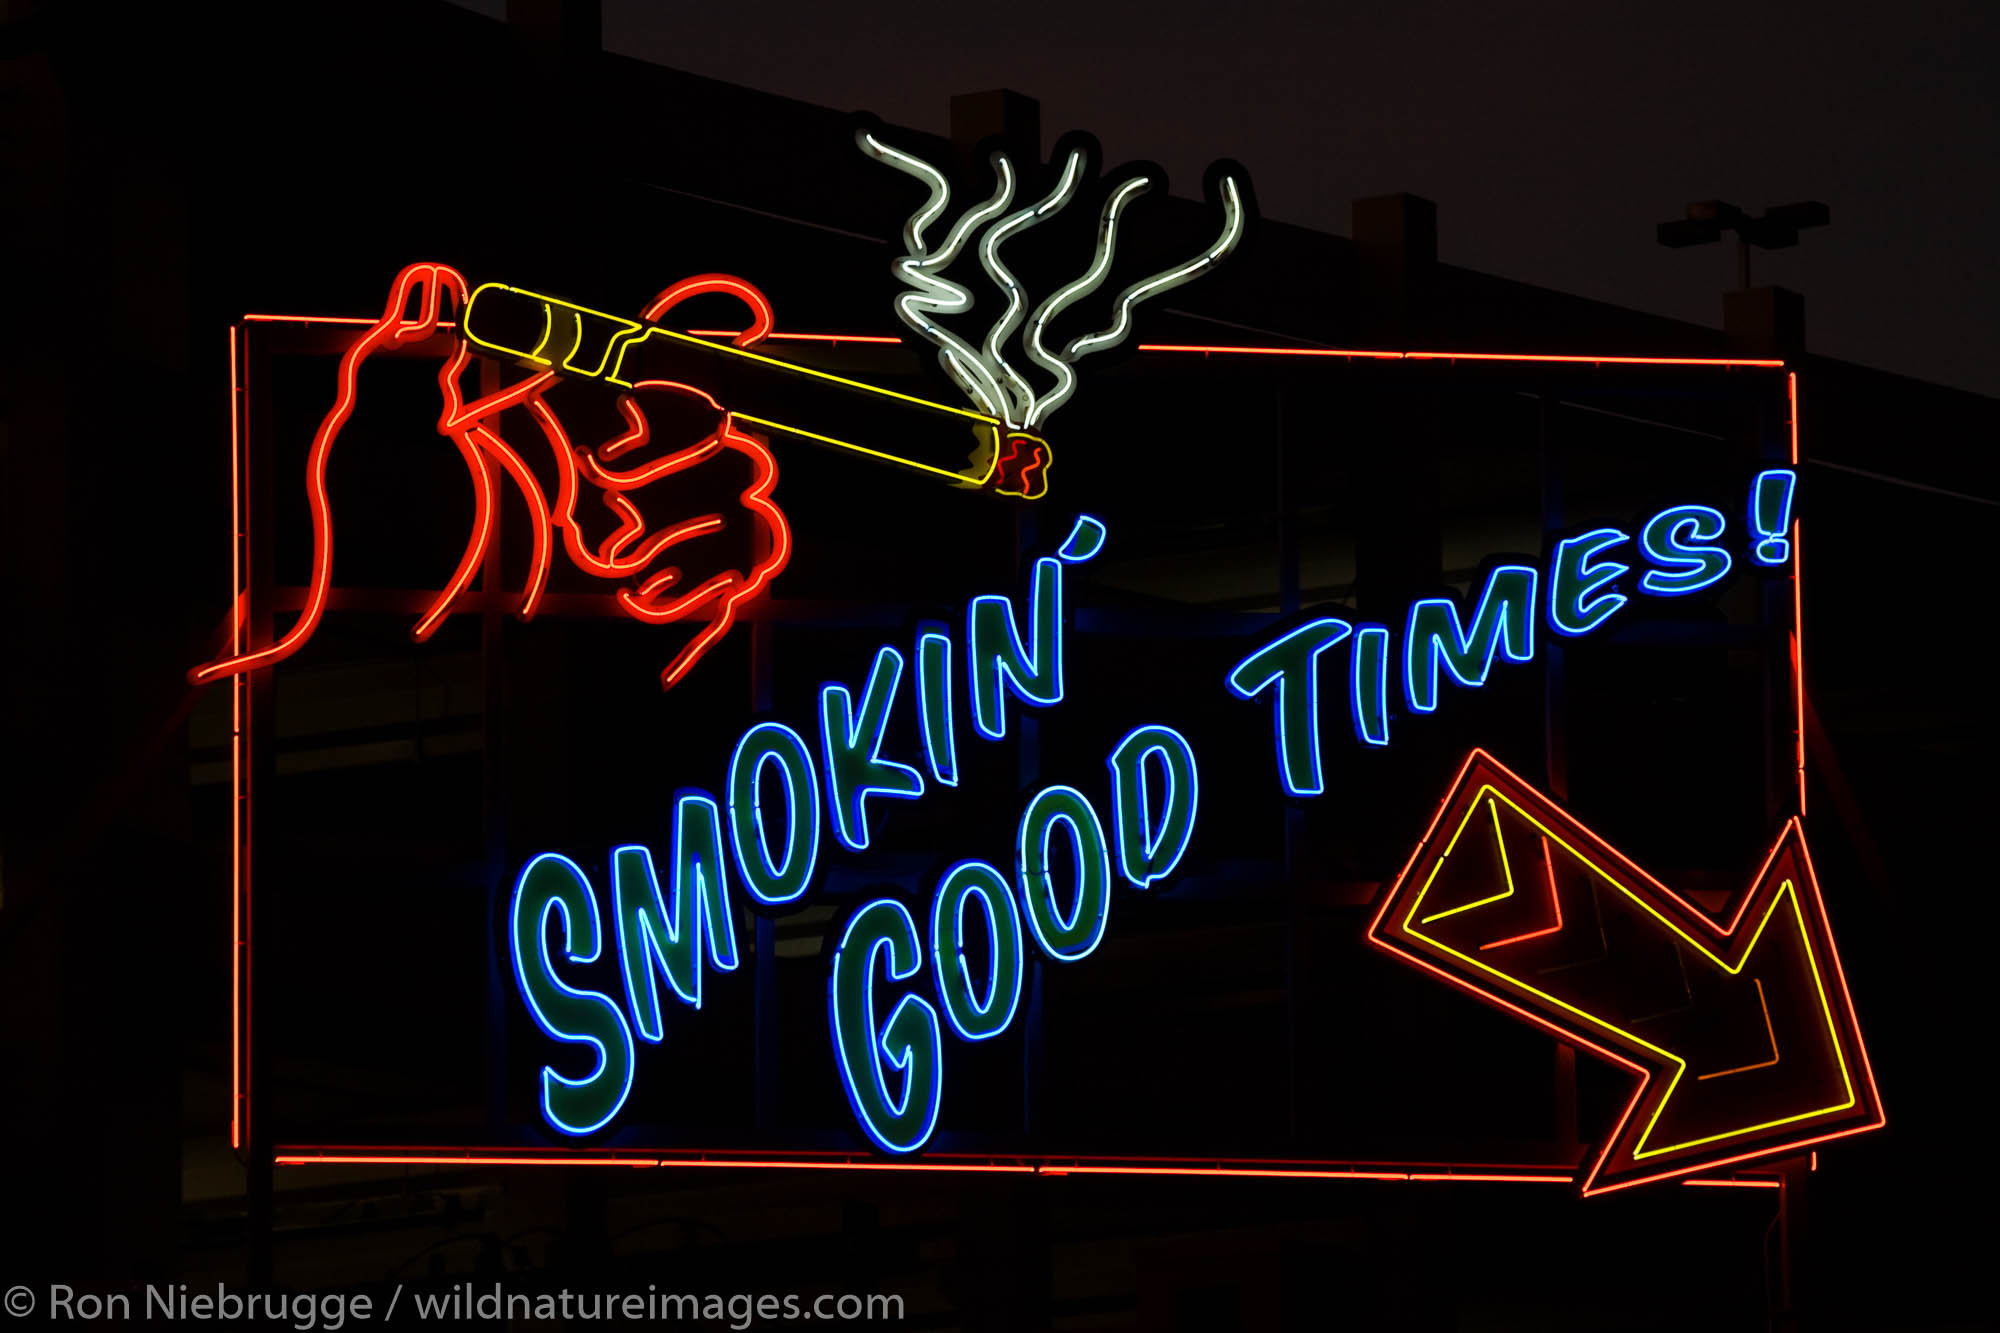 Smokin Good Times neon sign, downtown Las Vegas, Nevada.